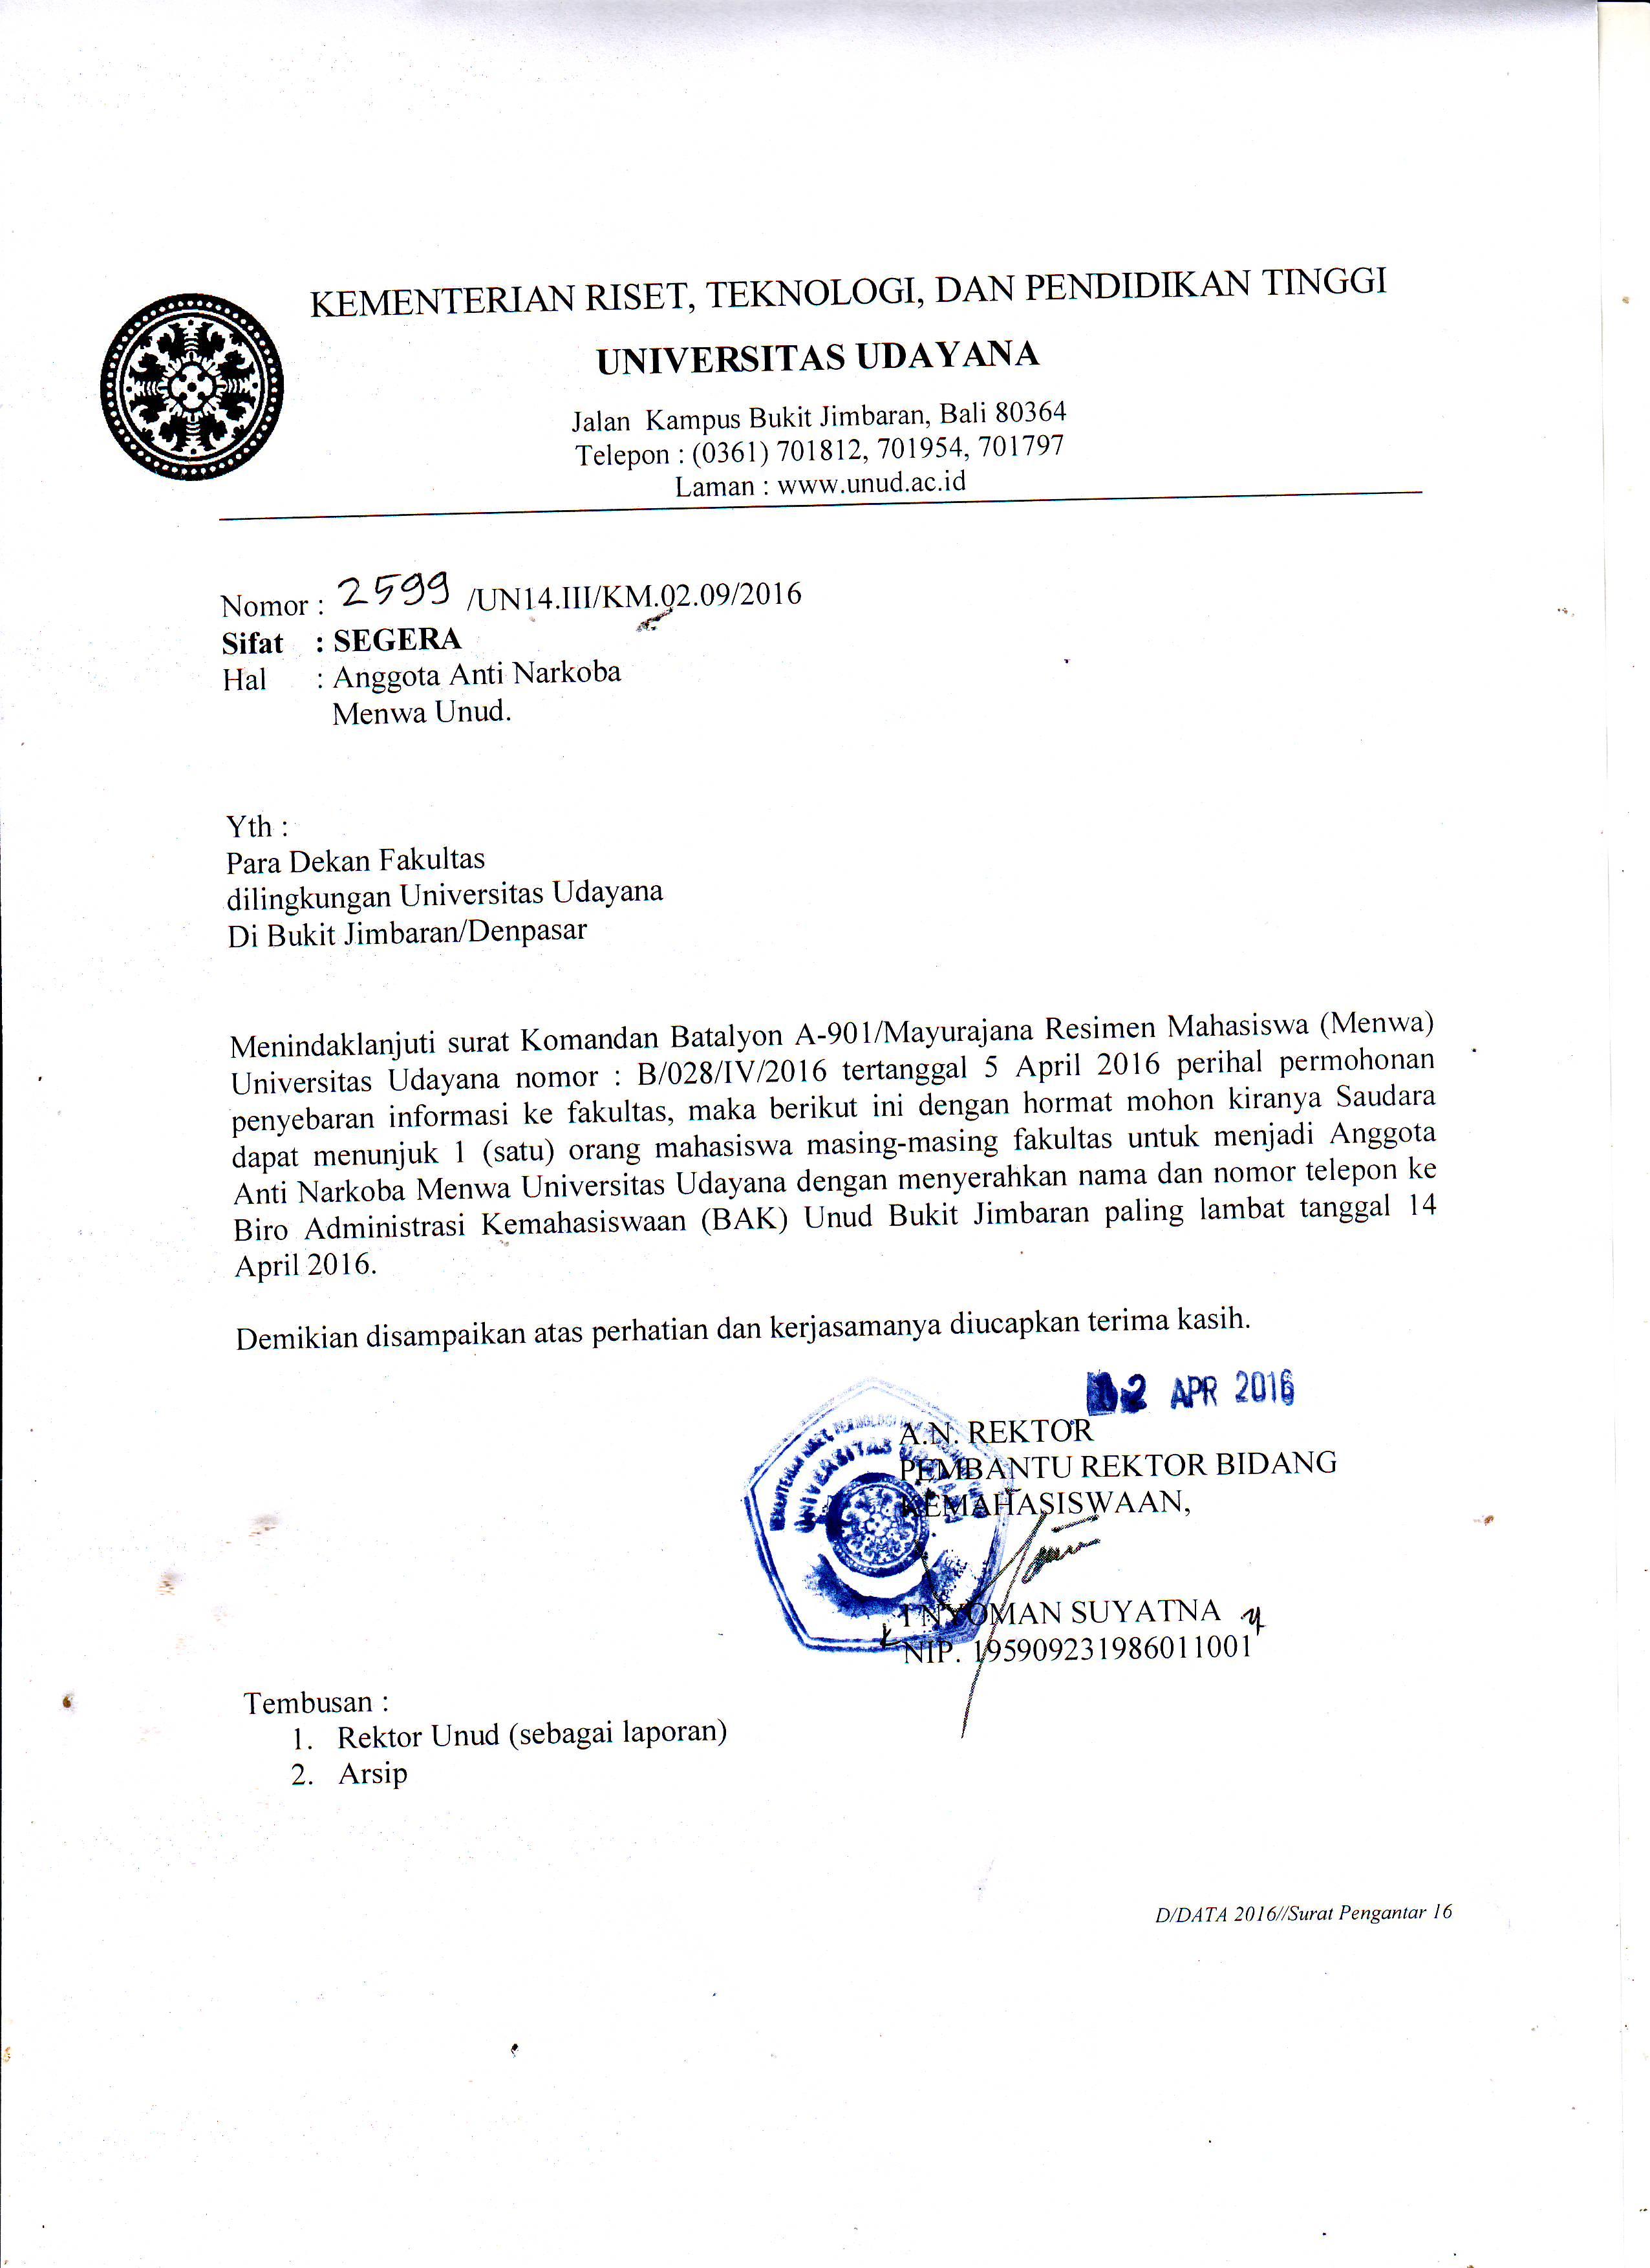 Unud Sinmawa Udayana Surat Undangan Menjadi Anggota Anti